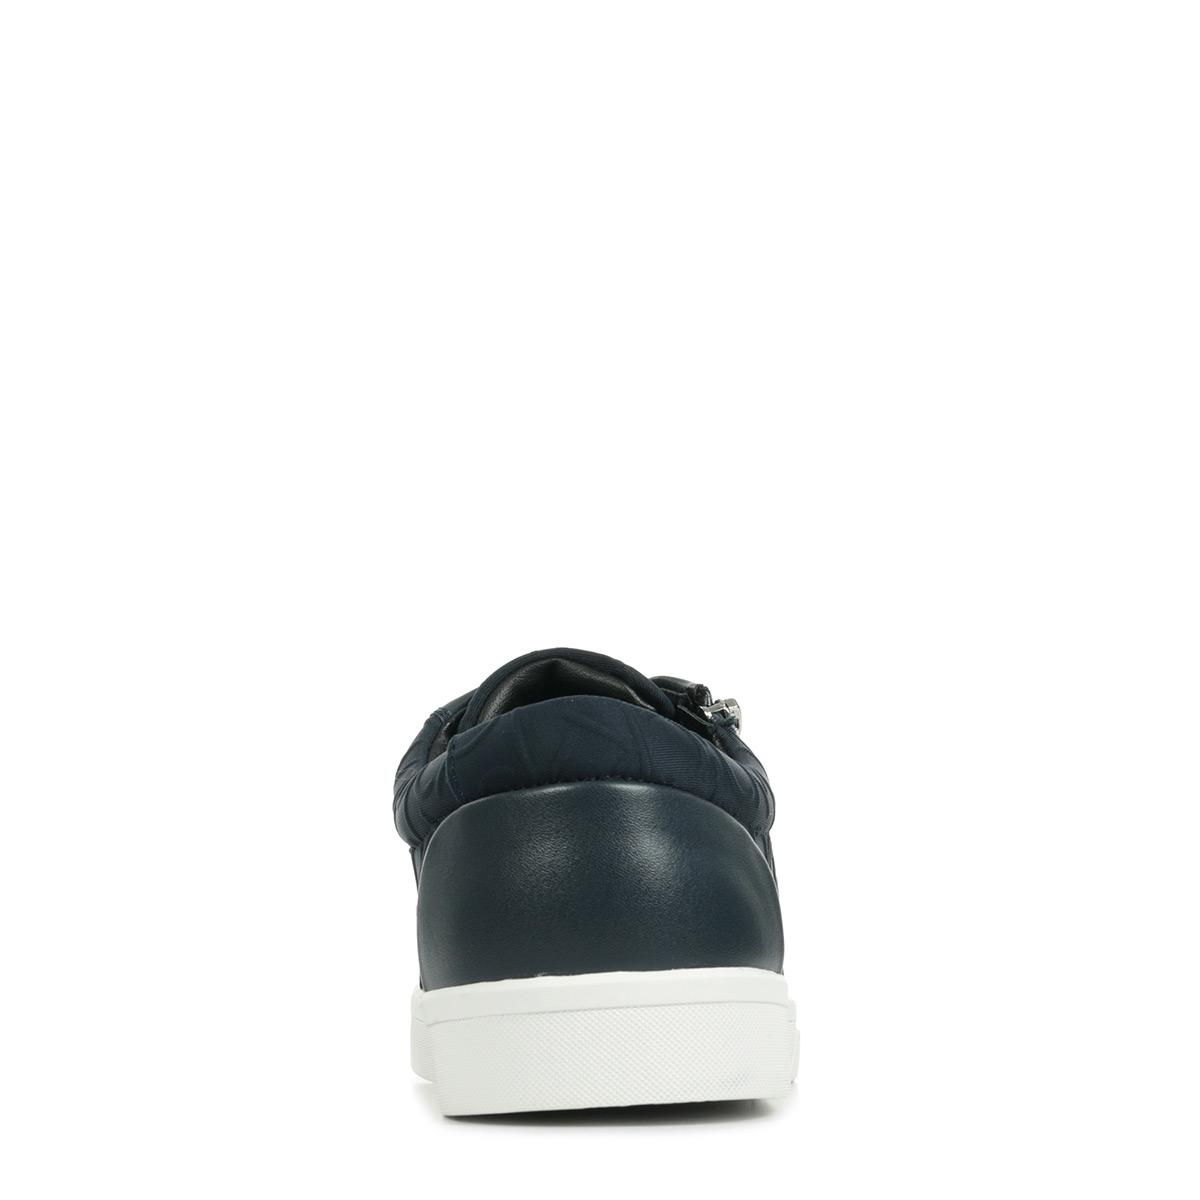 33e144f0e05af6 Calvin Klein Ibrahim Dark Navy F0875DNY Baskets mode homme achats Tfd4903oC  - itep-sessad-frot.fr